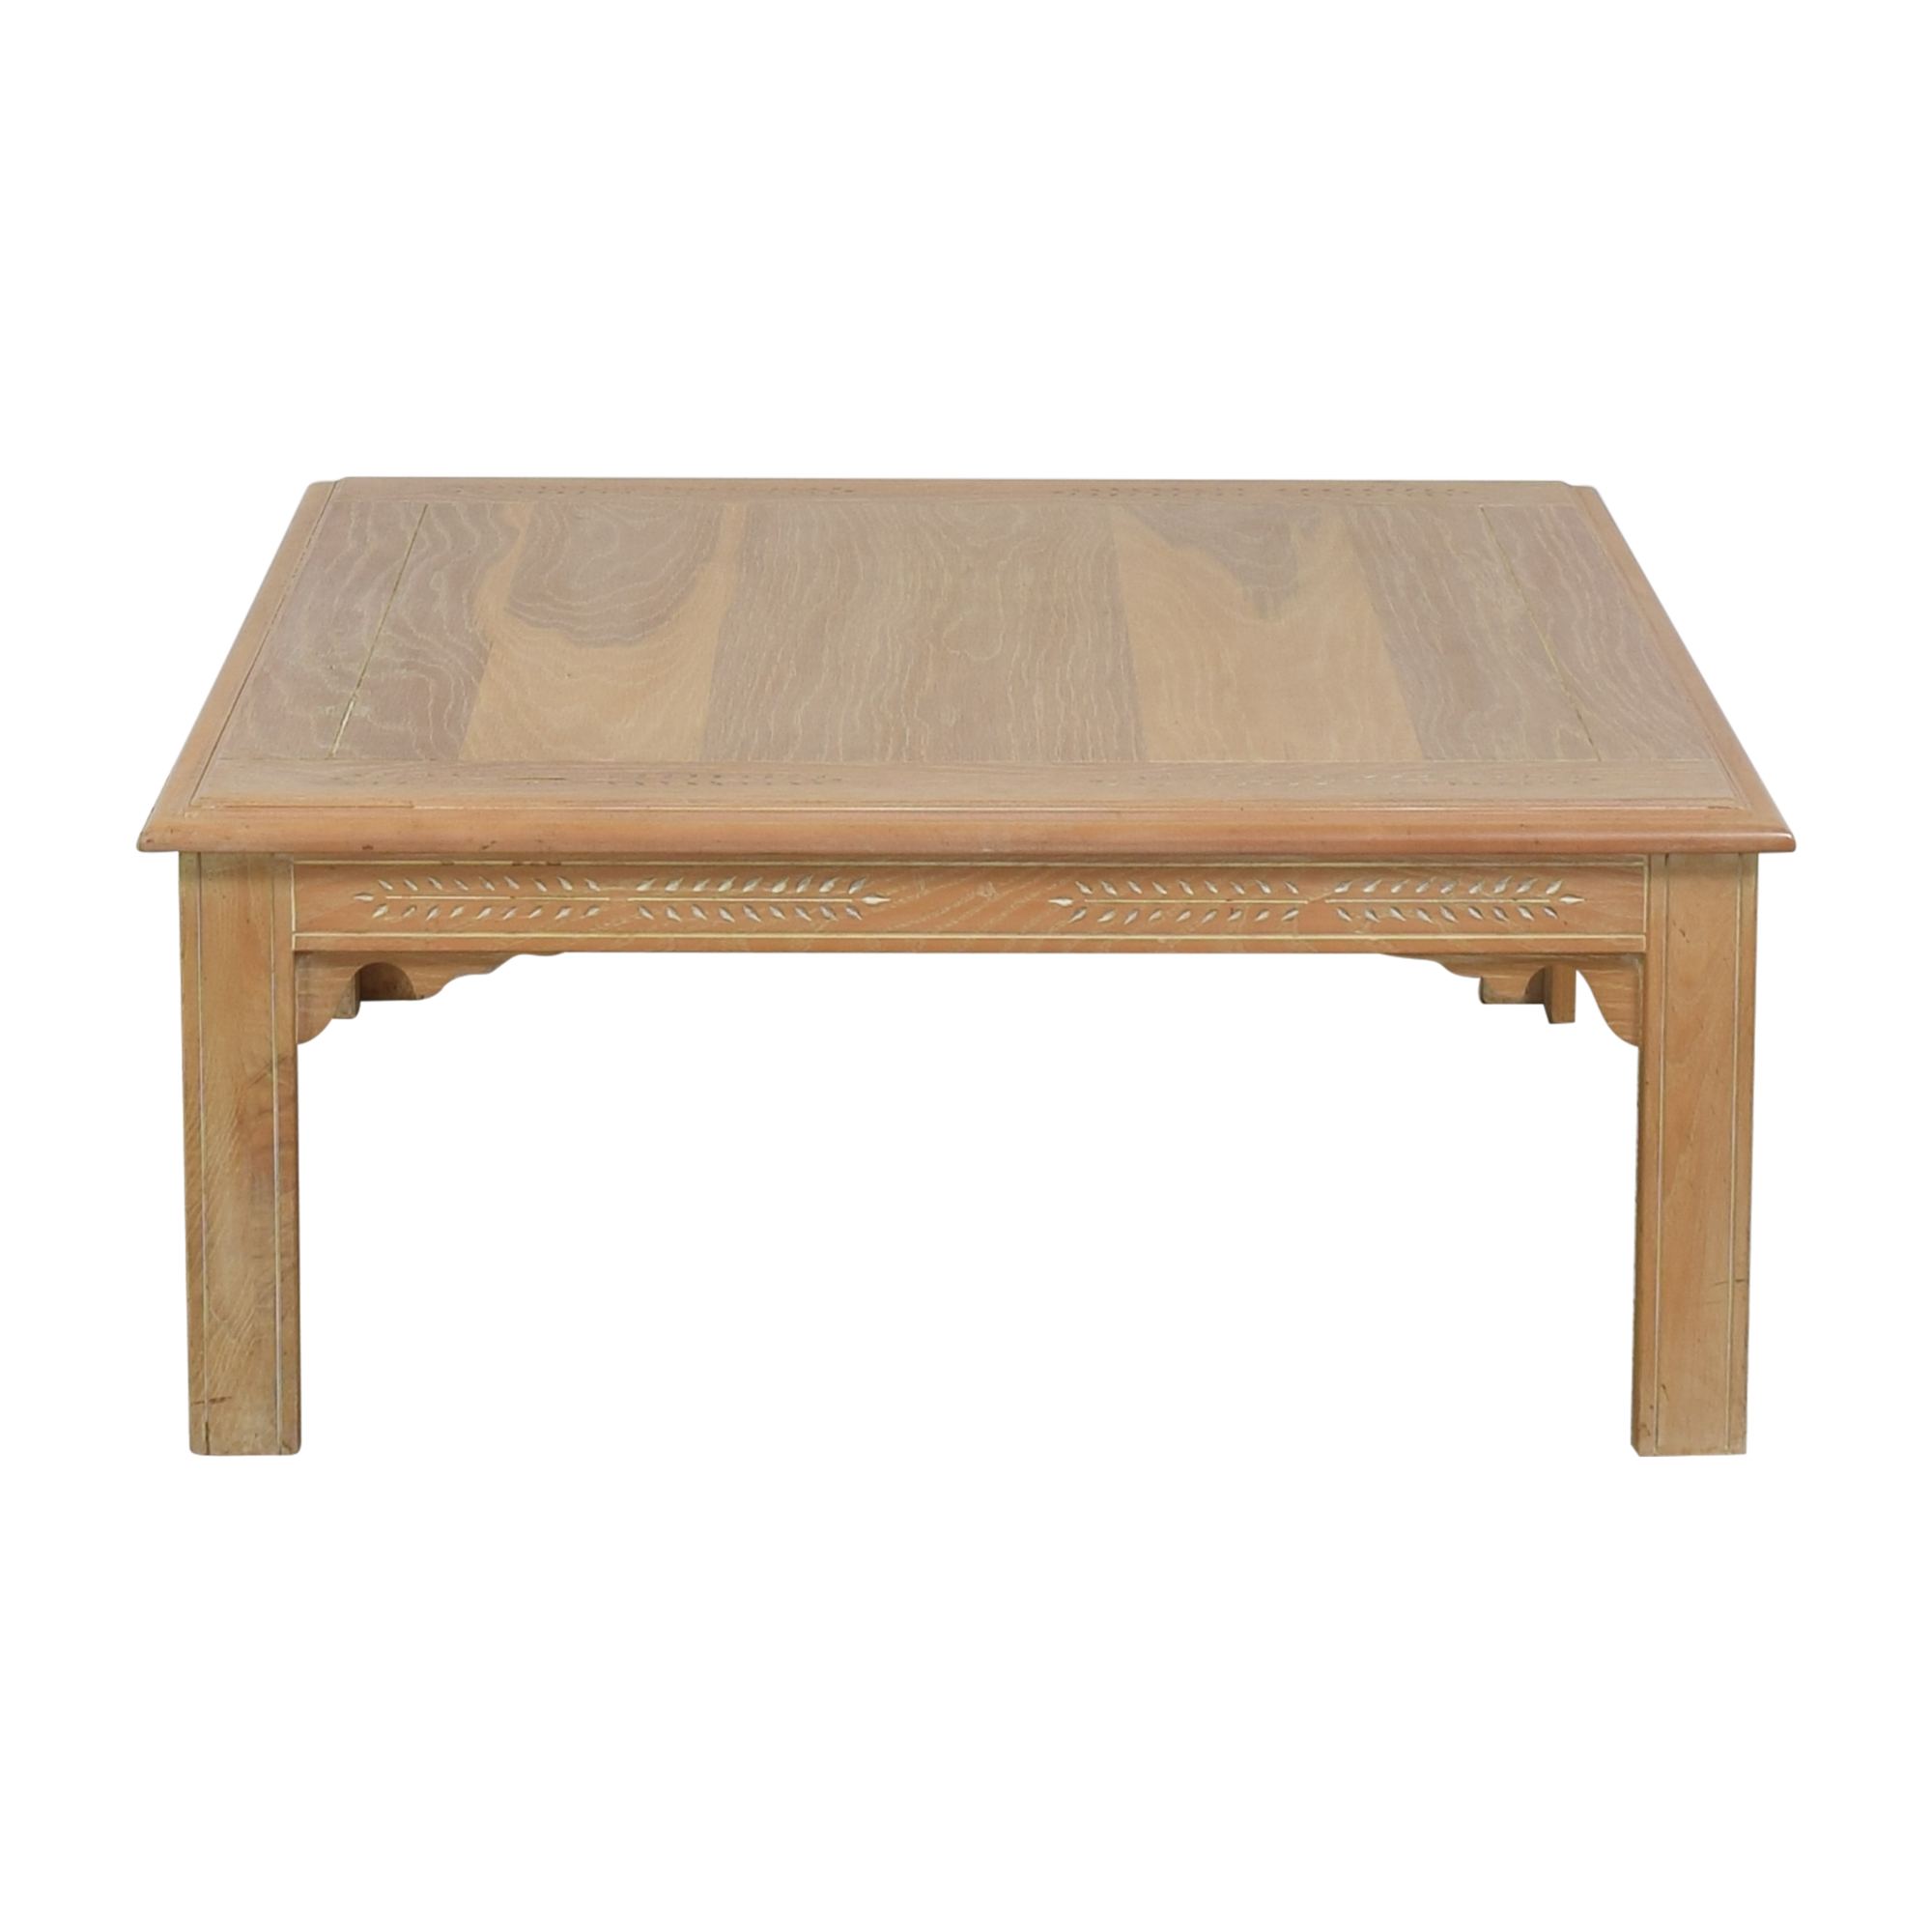 Lane Furniture Lane Furniture Virginia Maid Coffee Table pa